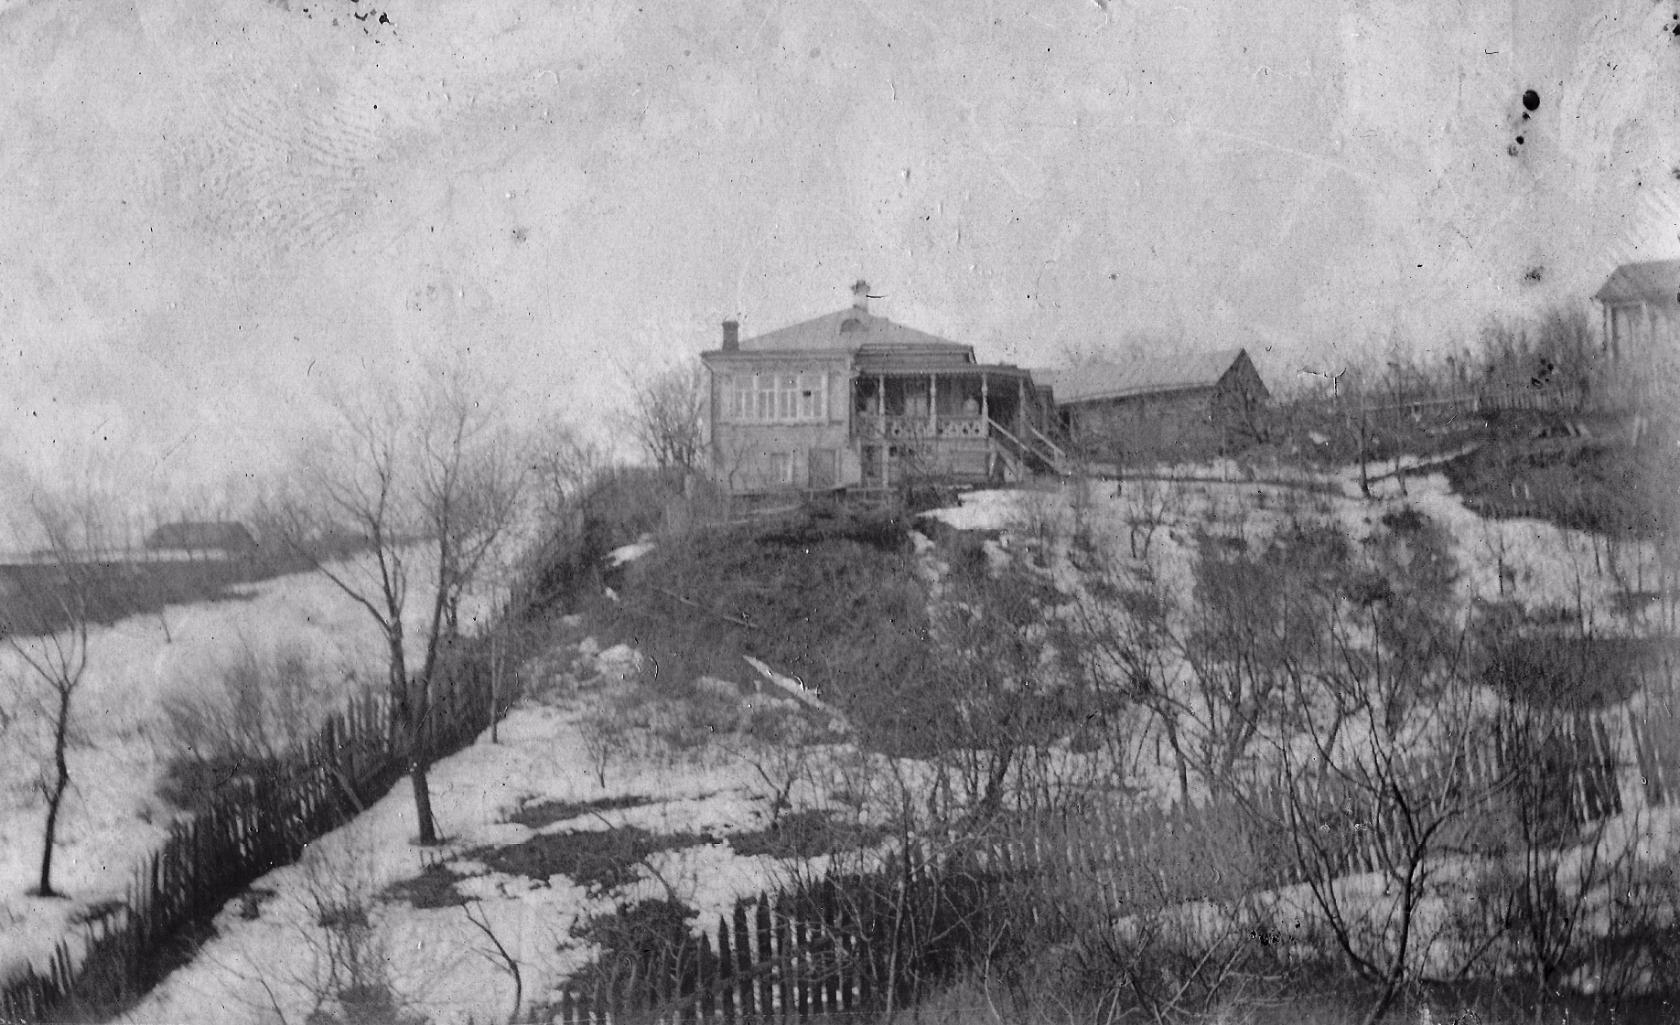 Дом Петра Ивановича Горбунова  в начале прошлого века